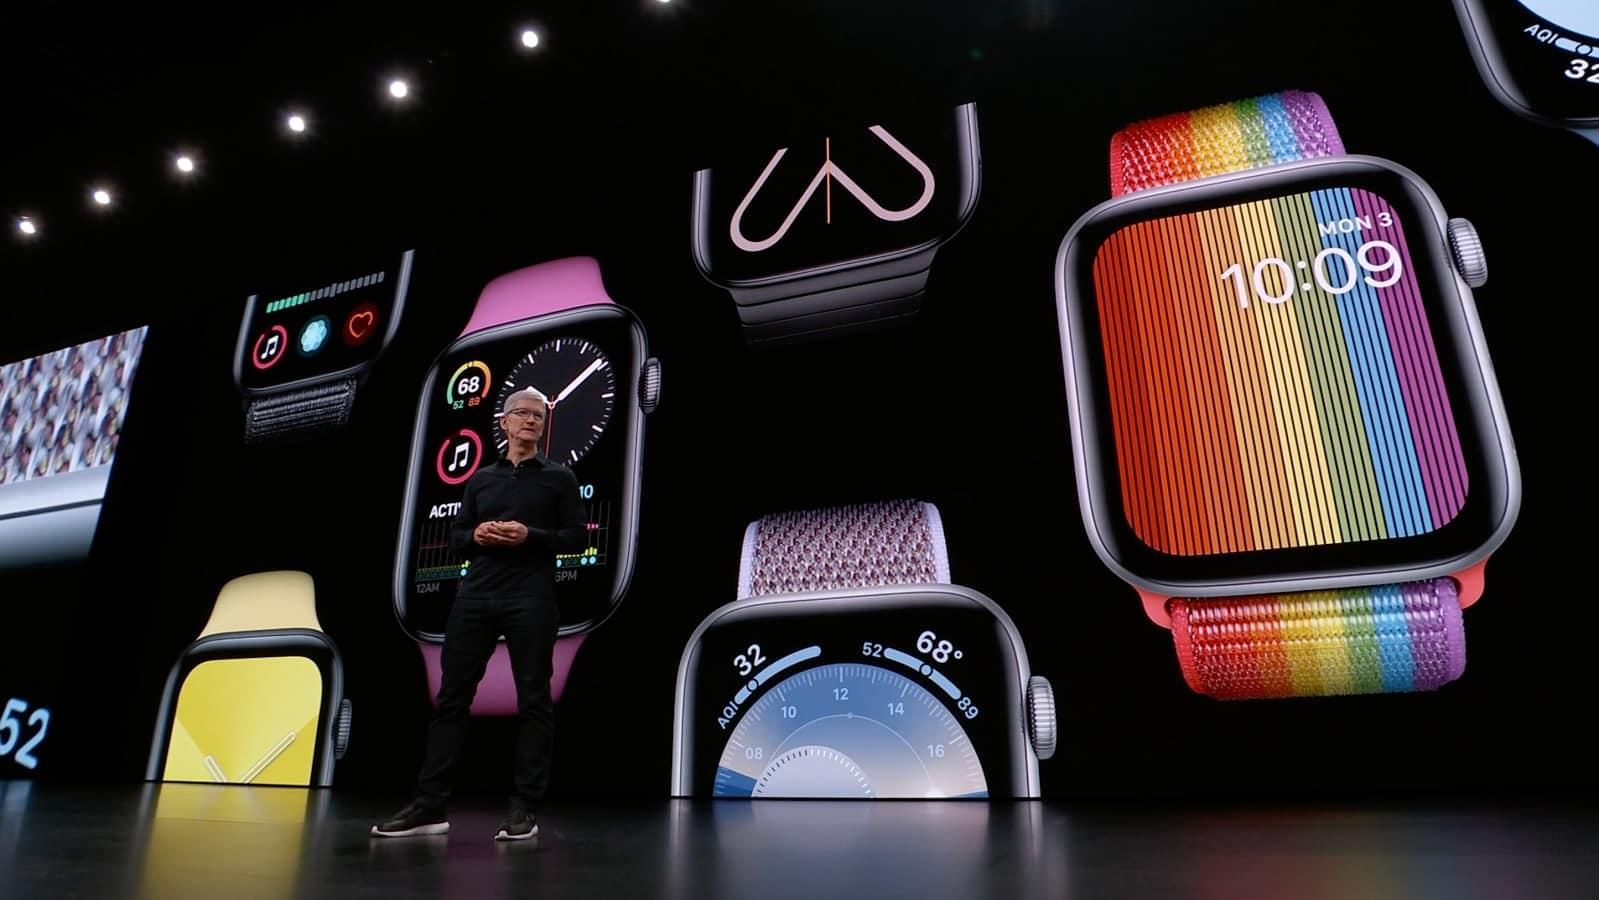 apple watch watchos new features wwdc 2019